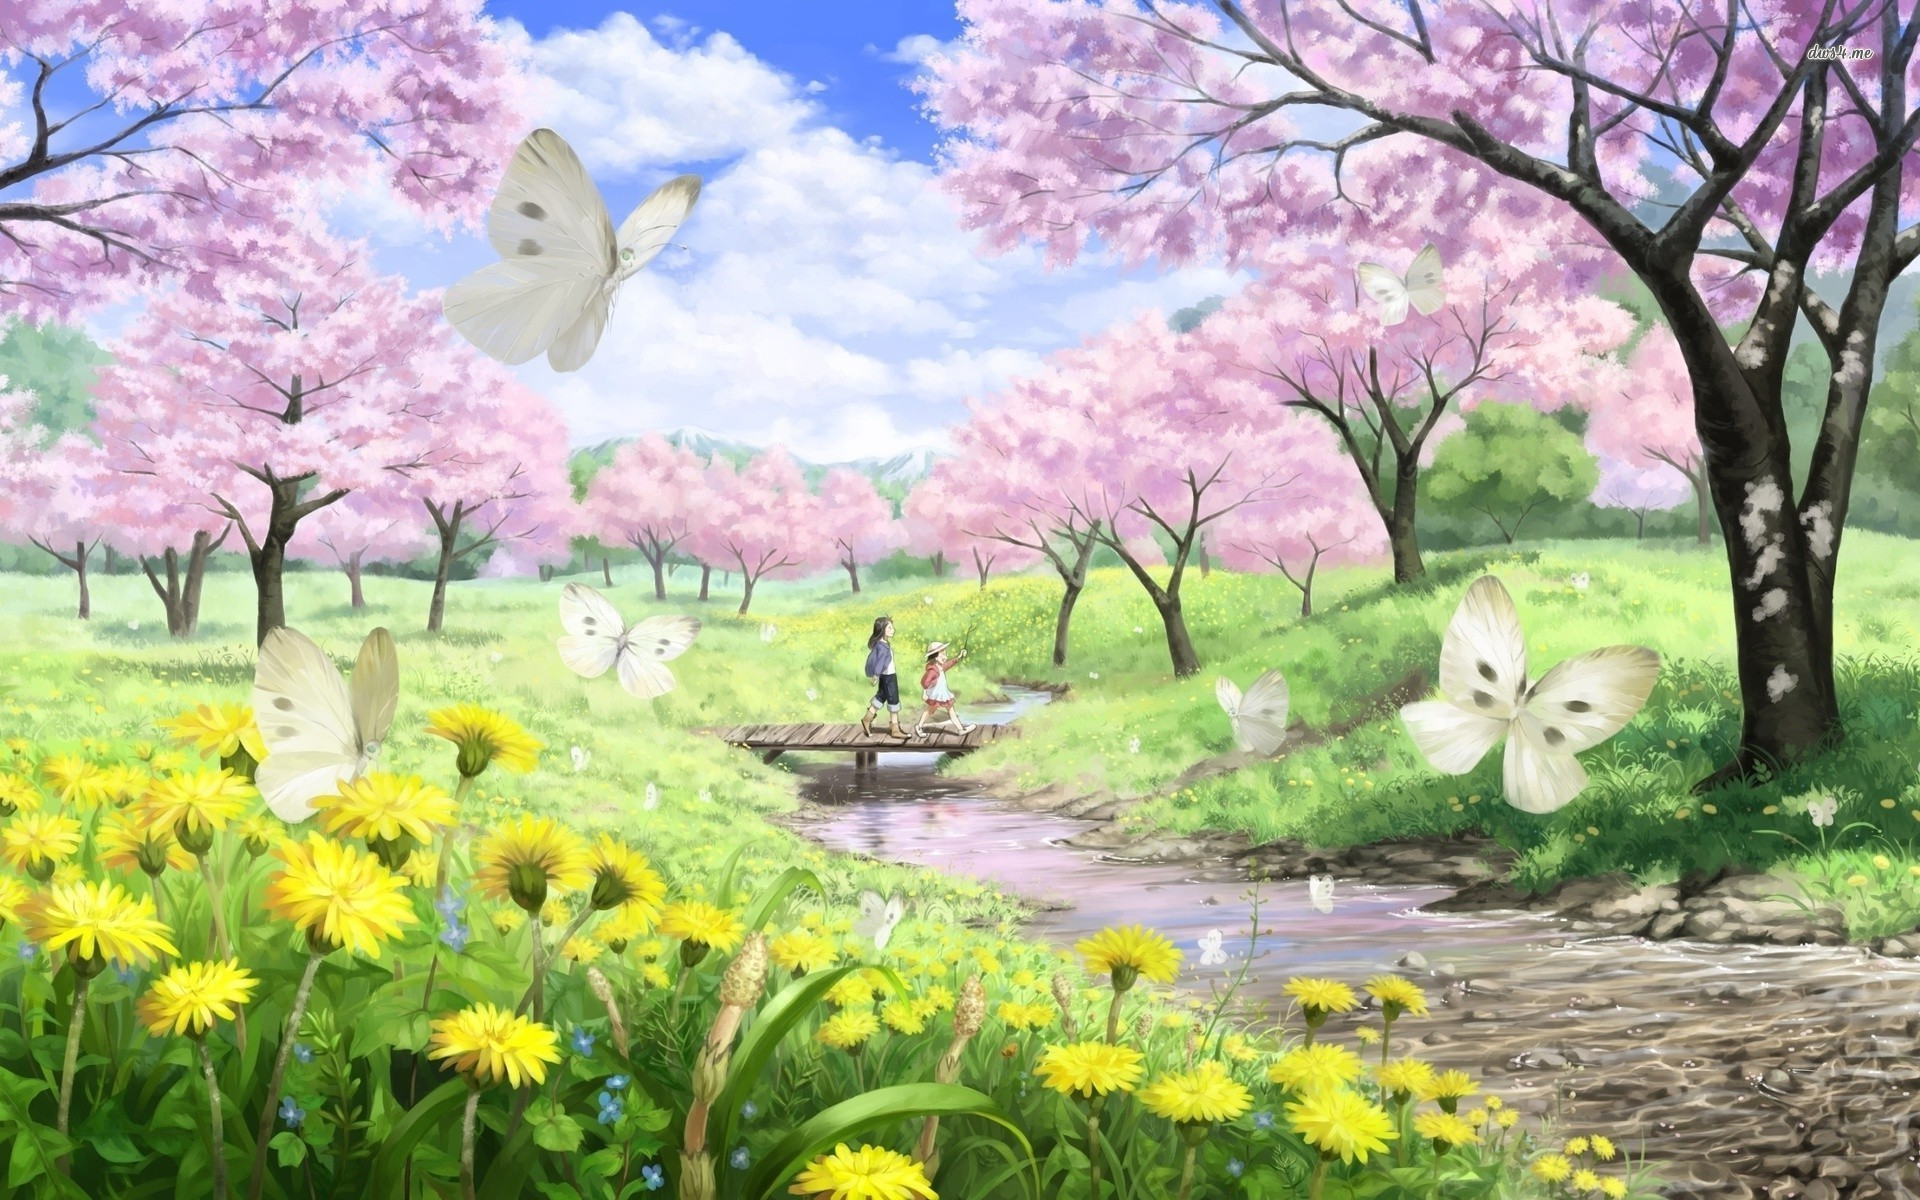 Related Anime cherry blossom wallpaper dowload